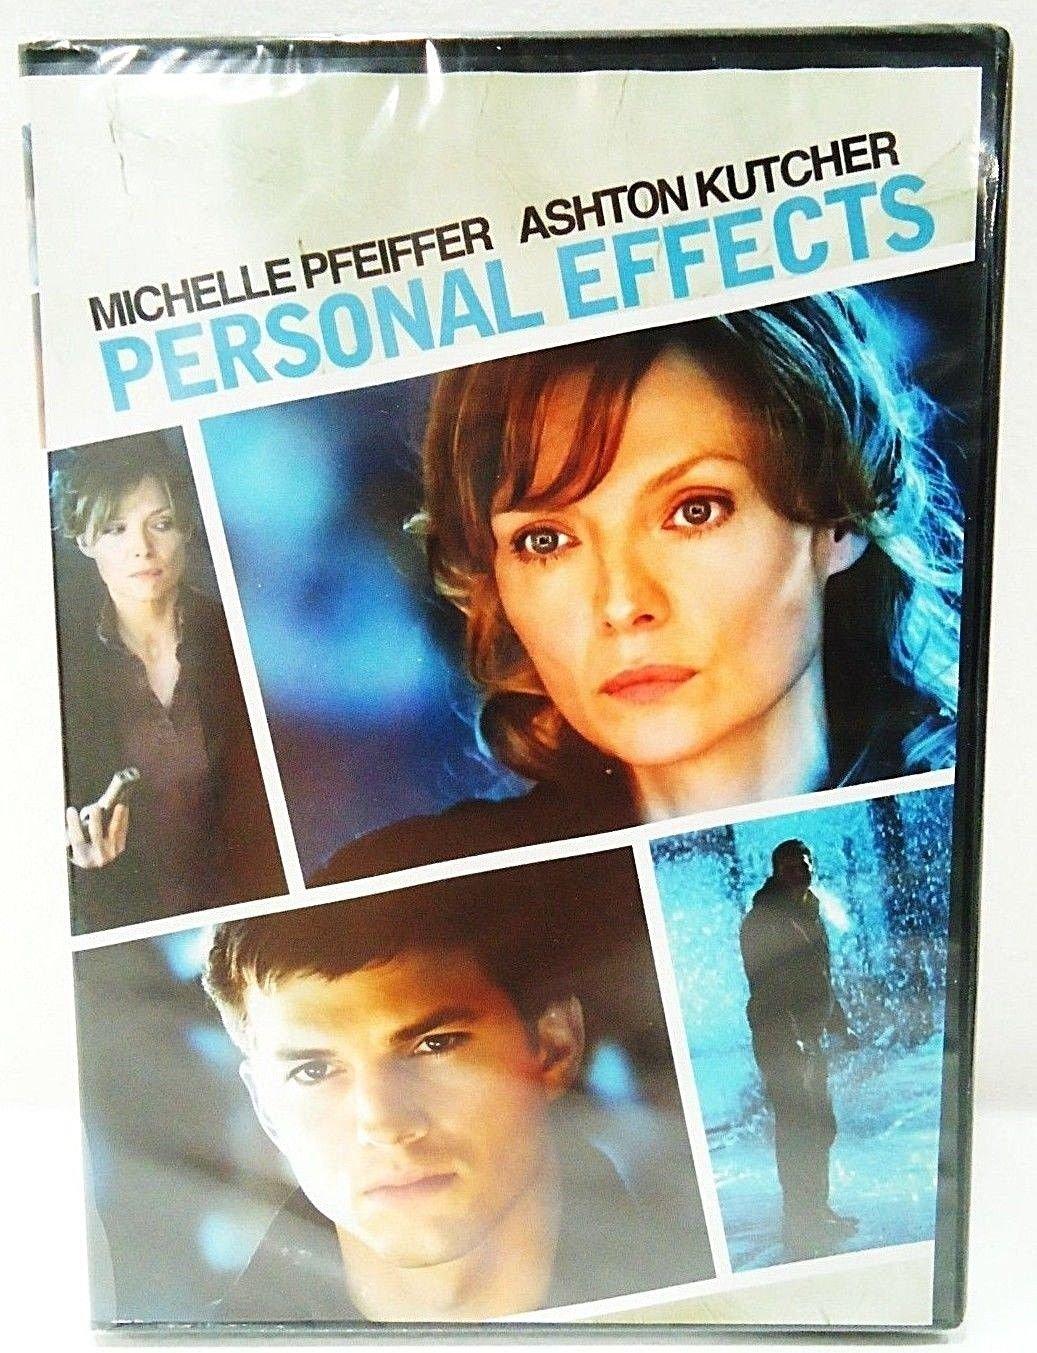 PERSONAL EFFECTS - DVD - ASHTON KUTCHER - BRAND NEW - SEALED - THRILLER - MOVIE